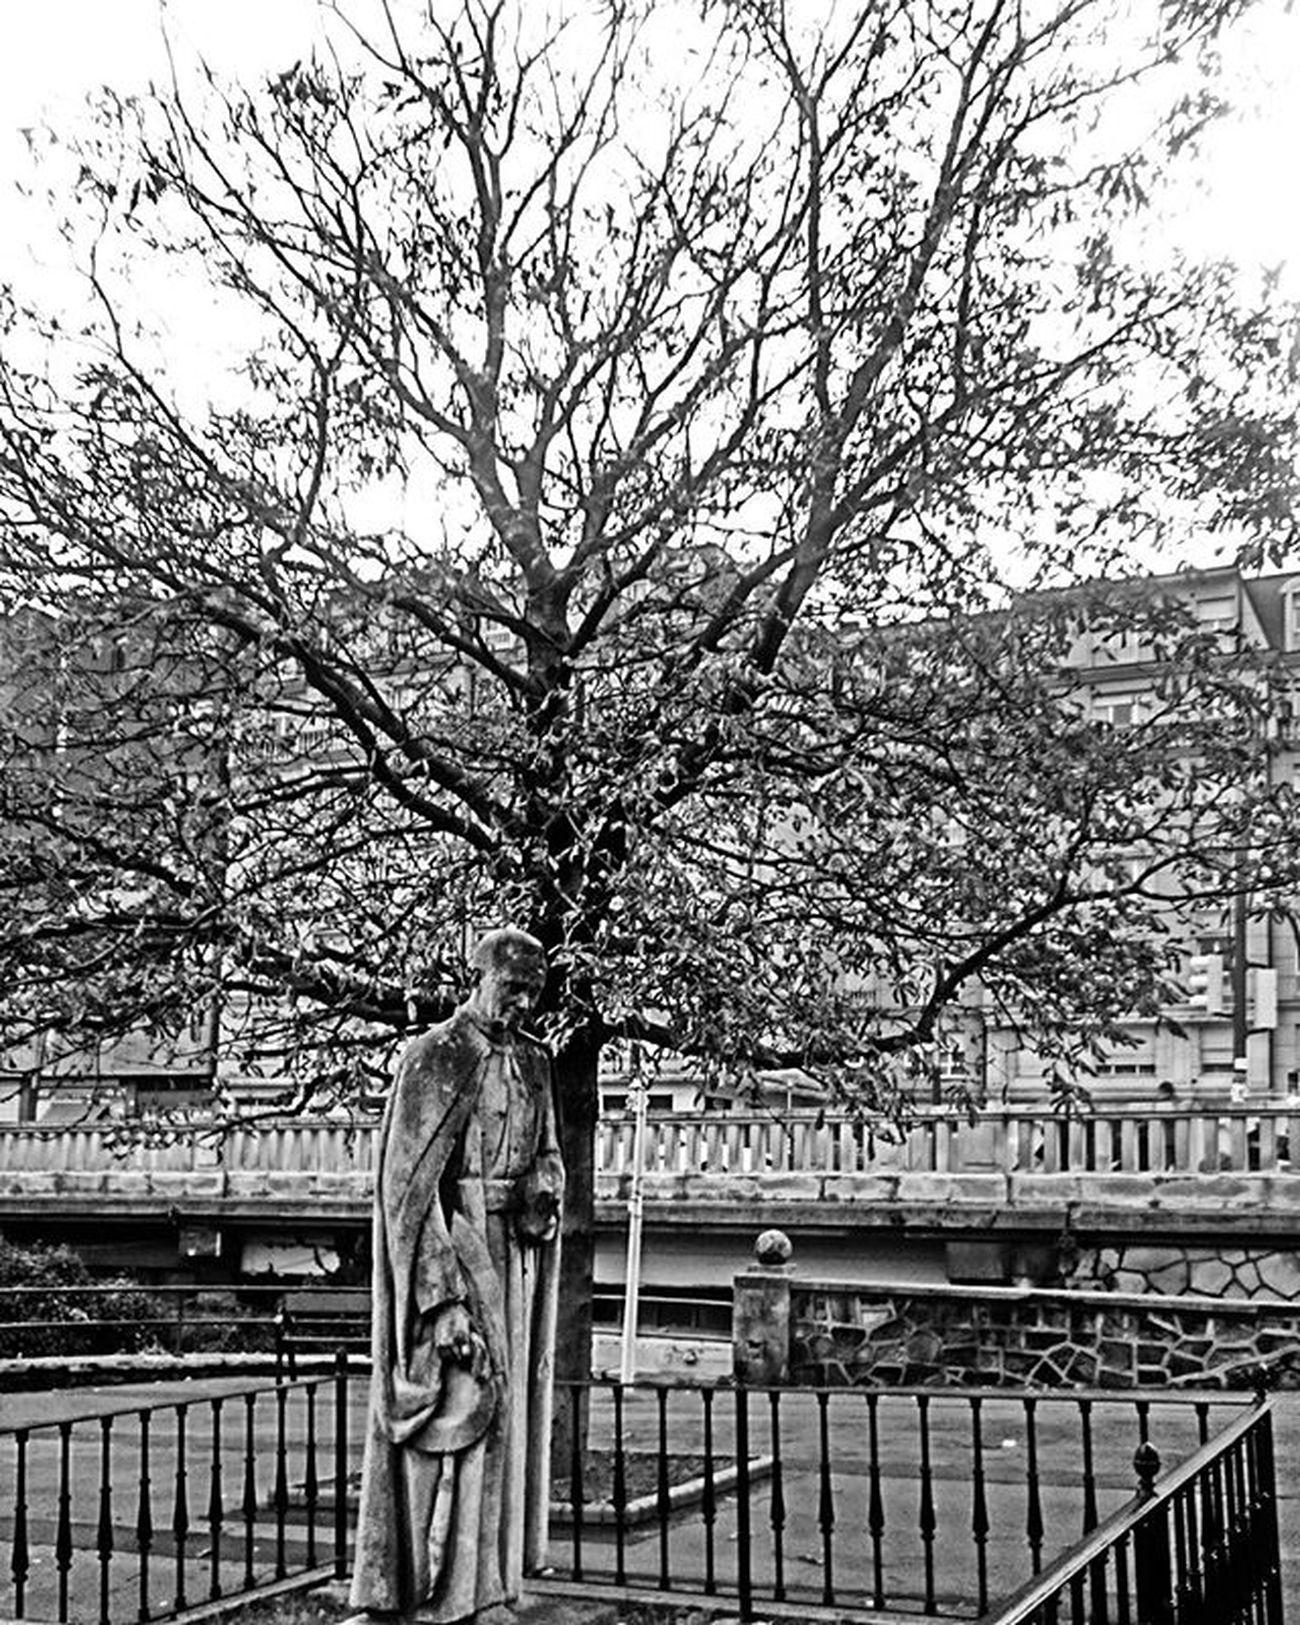 Deusto Bw Blackandwhite Blackandwhitephotography Bilbao Ilovebilbao Bilbaolovers Bilbosoul Verybilbao Visiteuskadi View Urban Landscape Landscape_lovers Igers Igersbilbao Webstagram Tagsforlikes Like4like All_shots Photooftheday Picoftheday Euskogram Euskadi Euskadigrafias Euskorincones loves_euskadi visiteuskadi total_euskadi turismo_euskadi